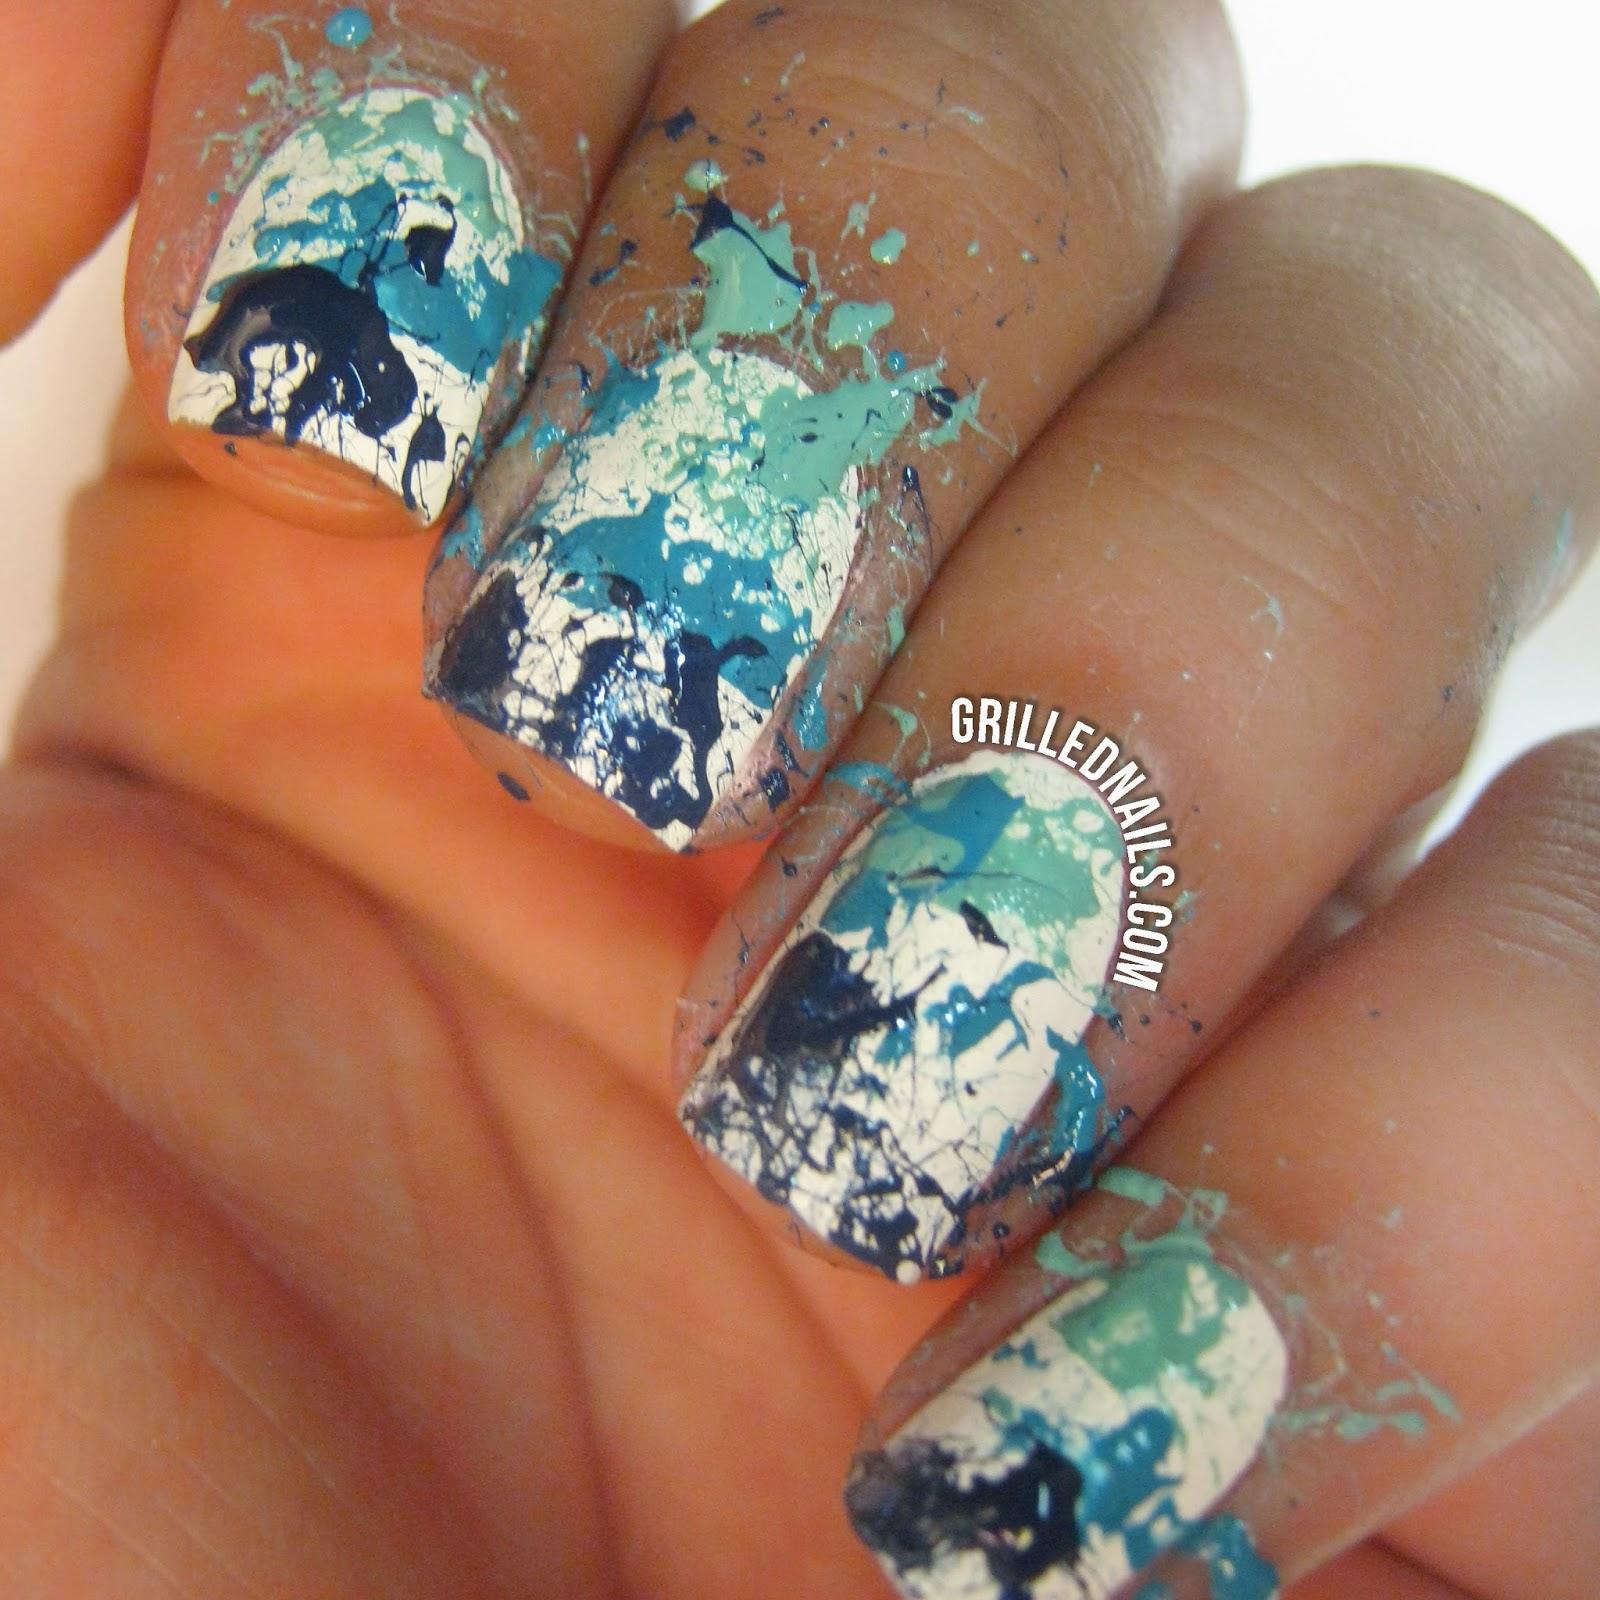 Awesome Funky Nails Art Thick Spring Nail Polish Rectangular Diflucan Nail Fungus Nail Treatment Fungus Young Gosh Nail Polish ColouredNail Bed Fungus Paint Splatter Acrylic Nails Images